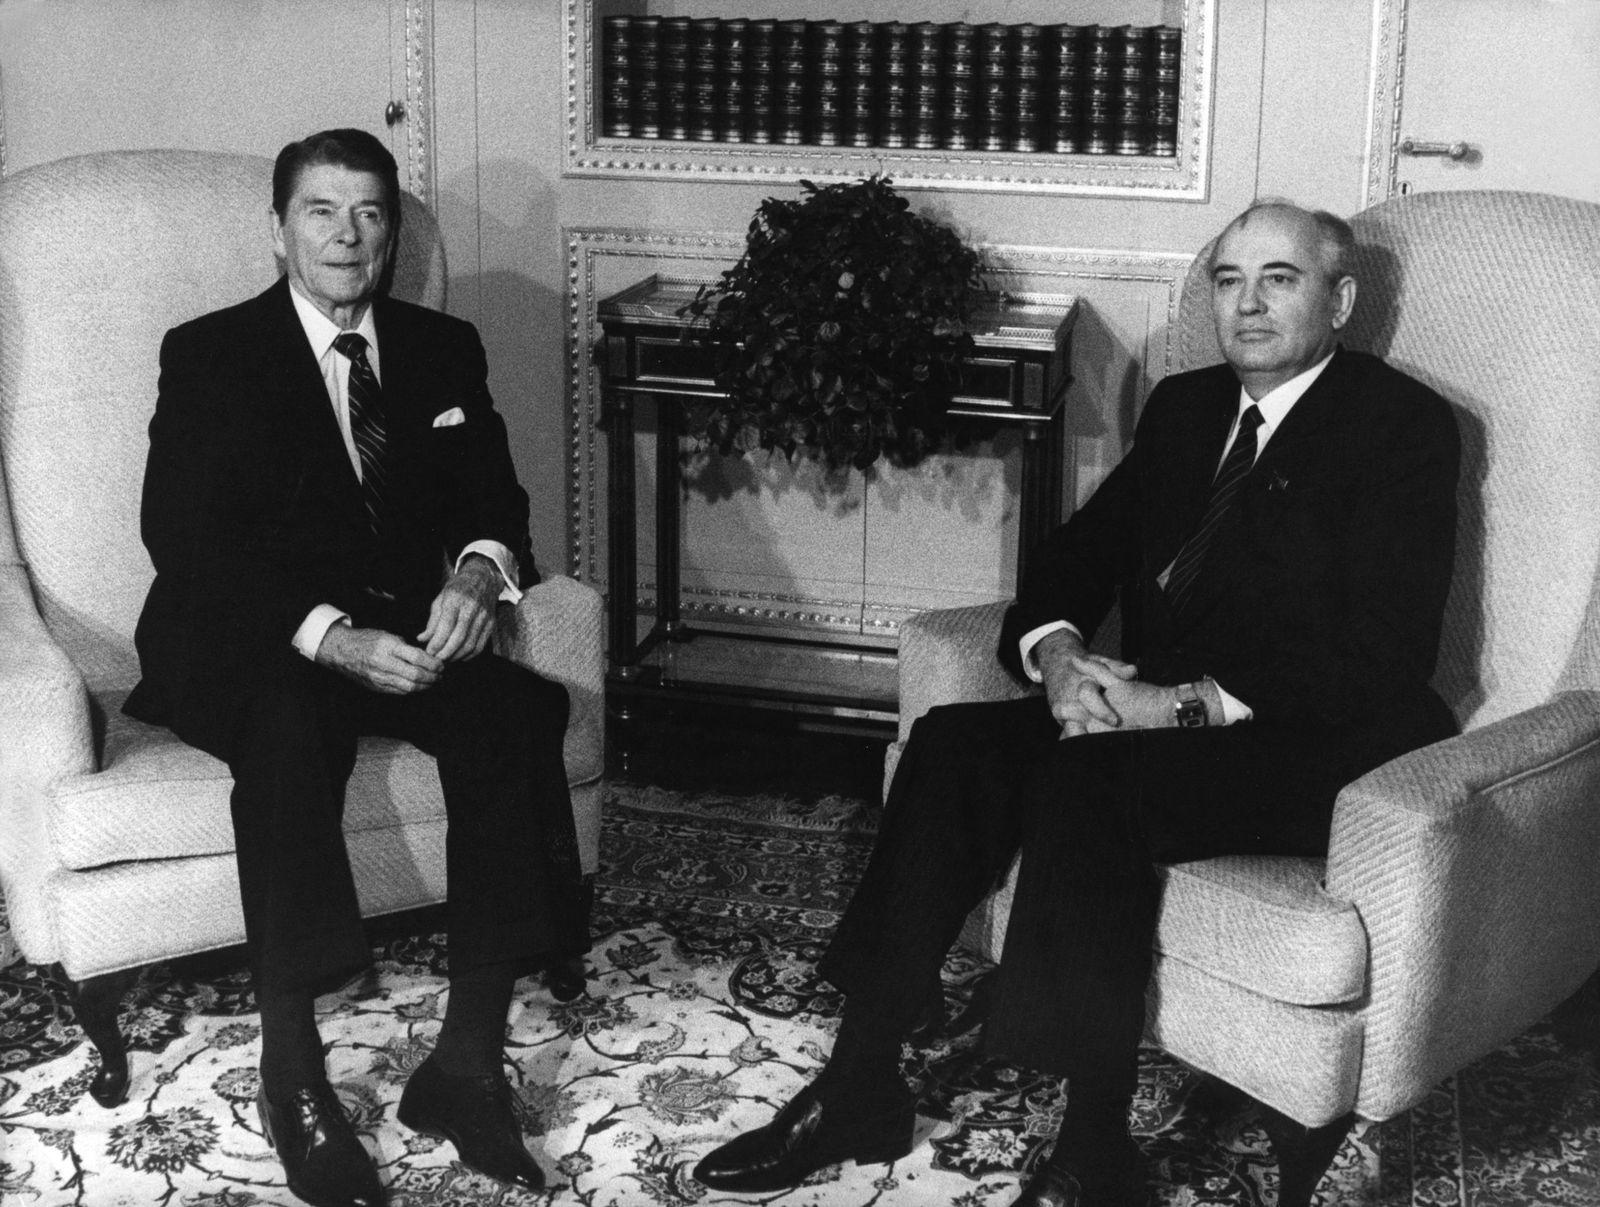 Reagan / Gorbatschow